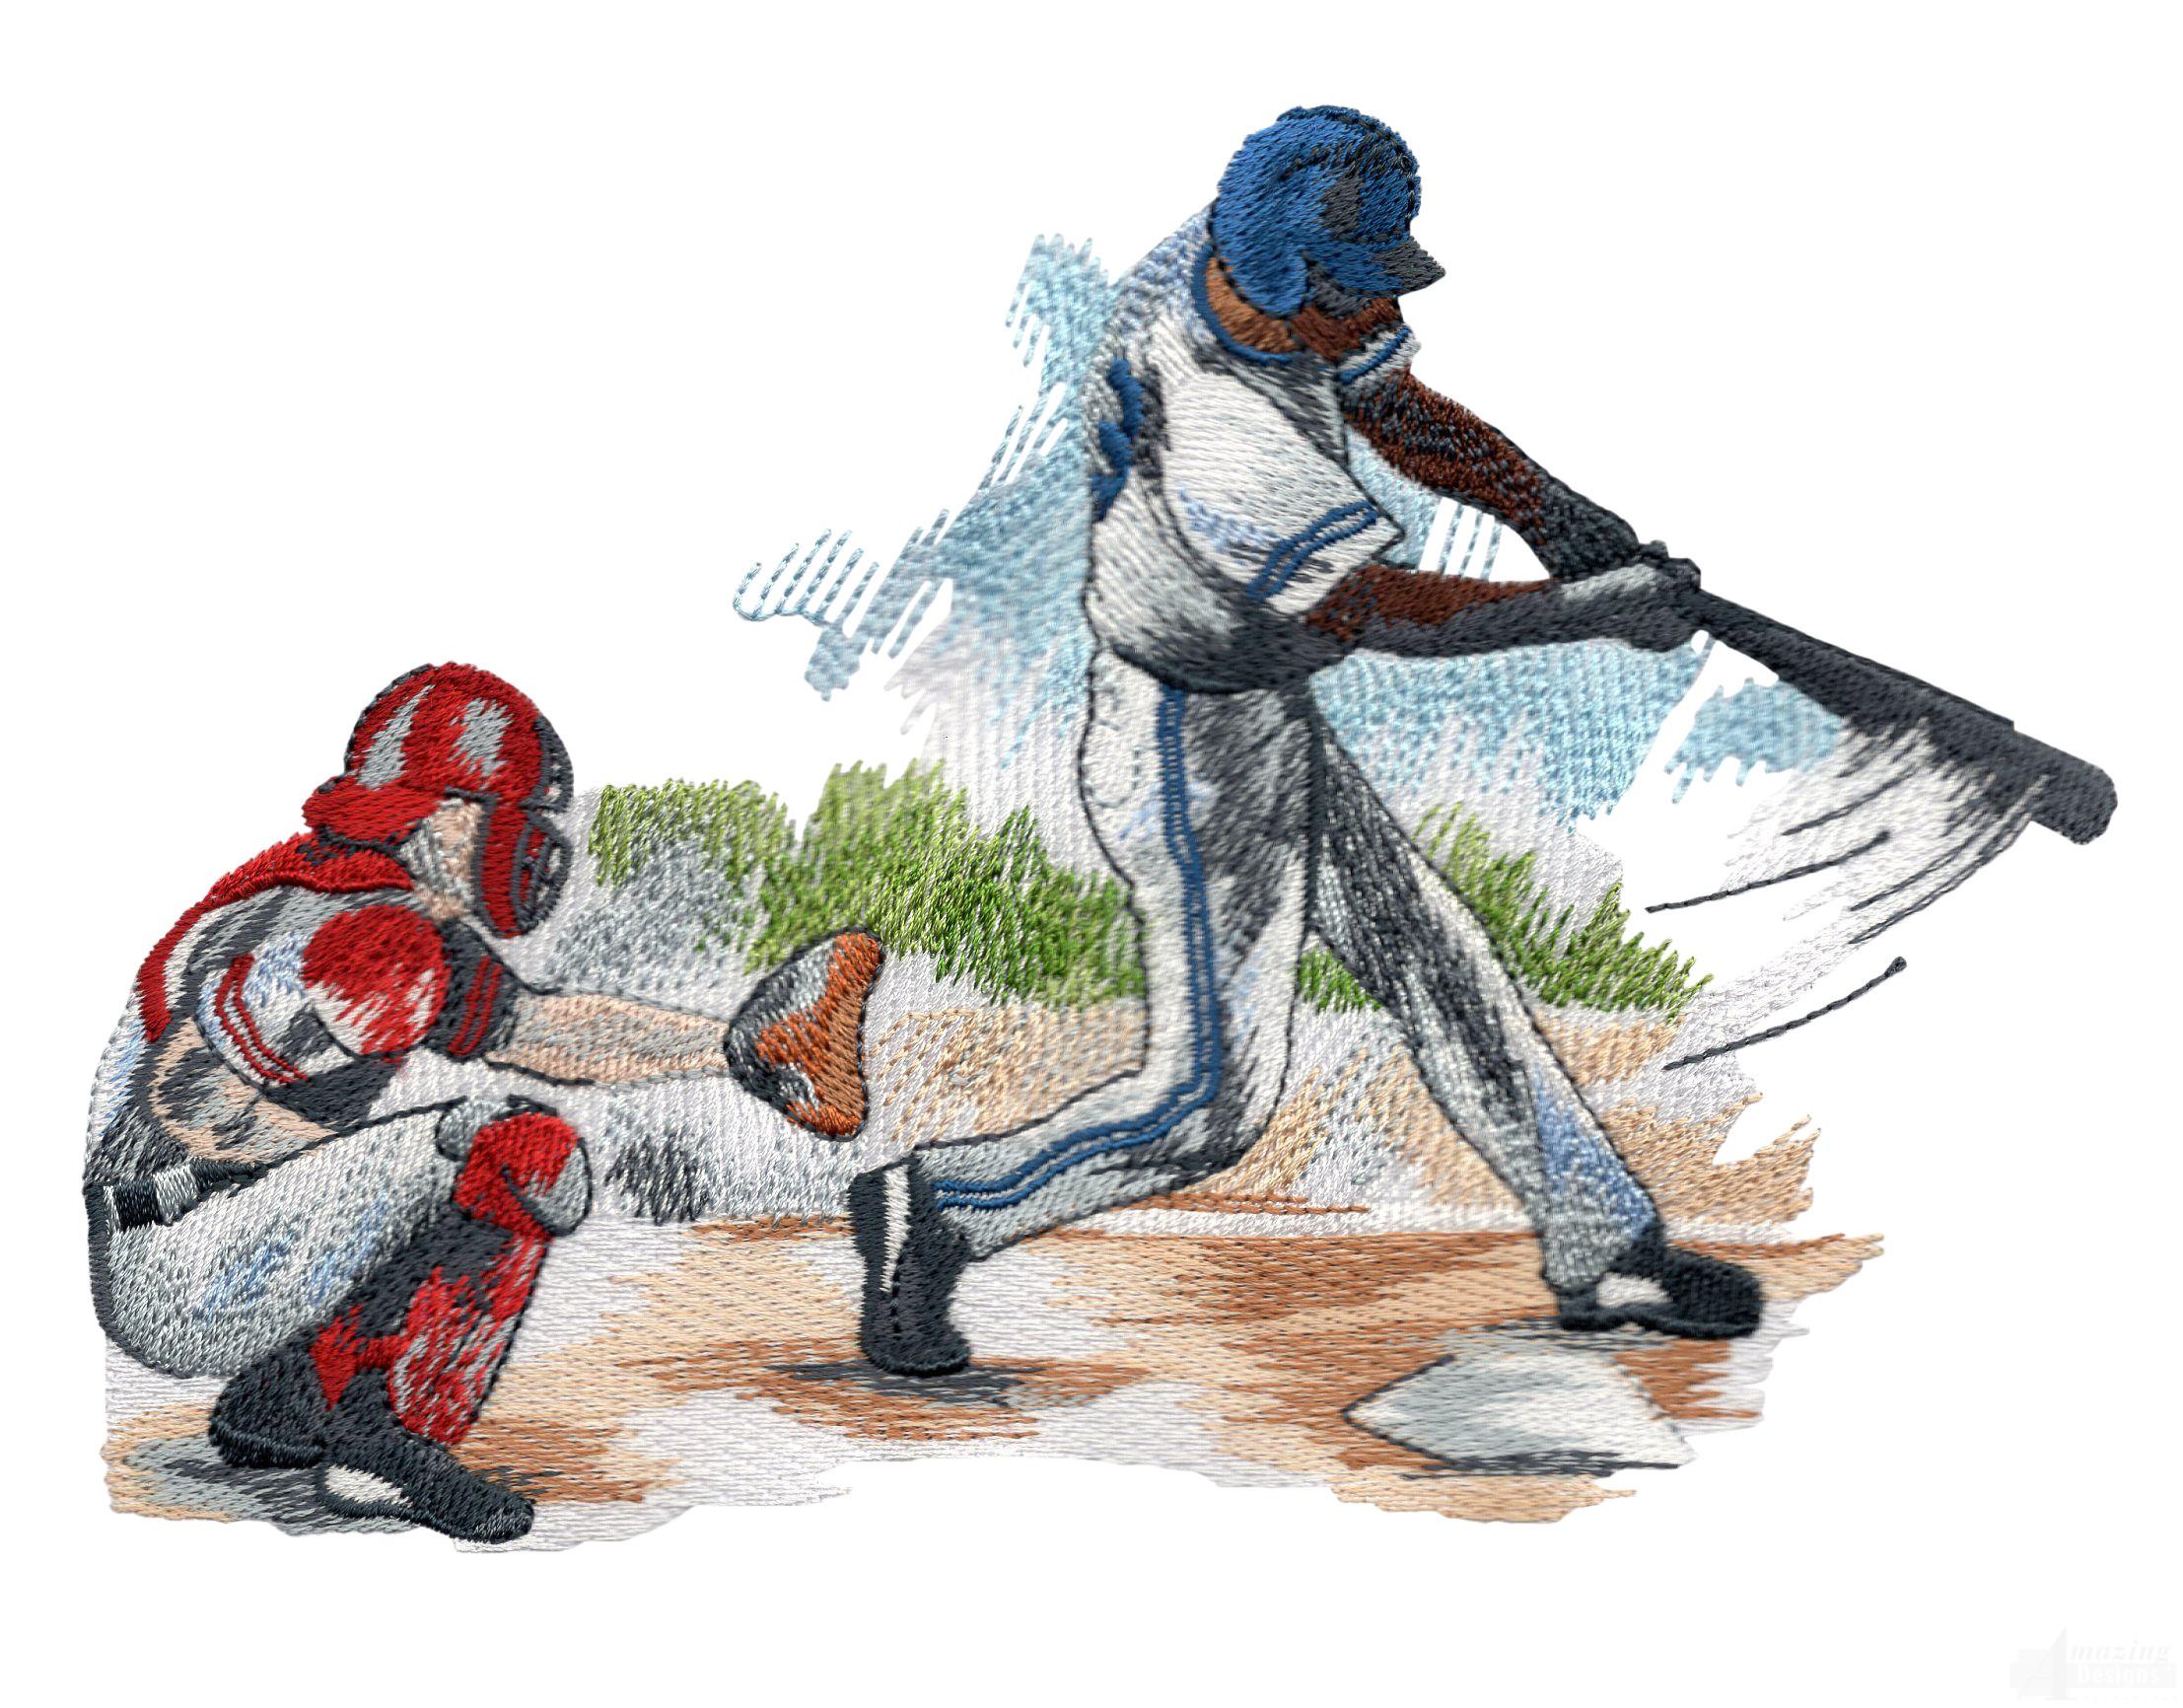 Big Swing Game Day Baseball Embroidery Design